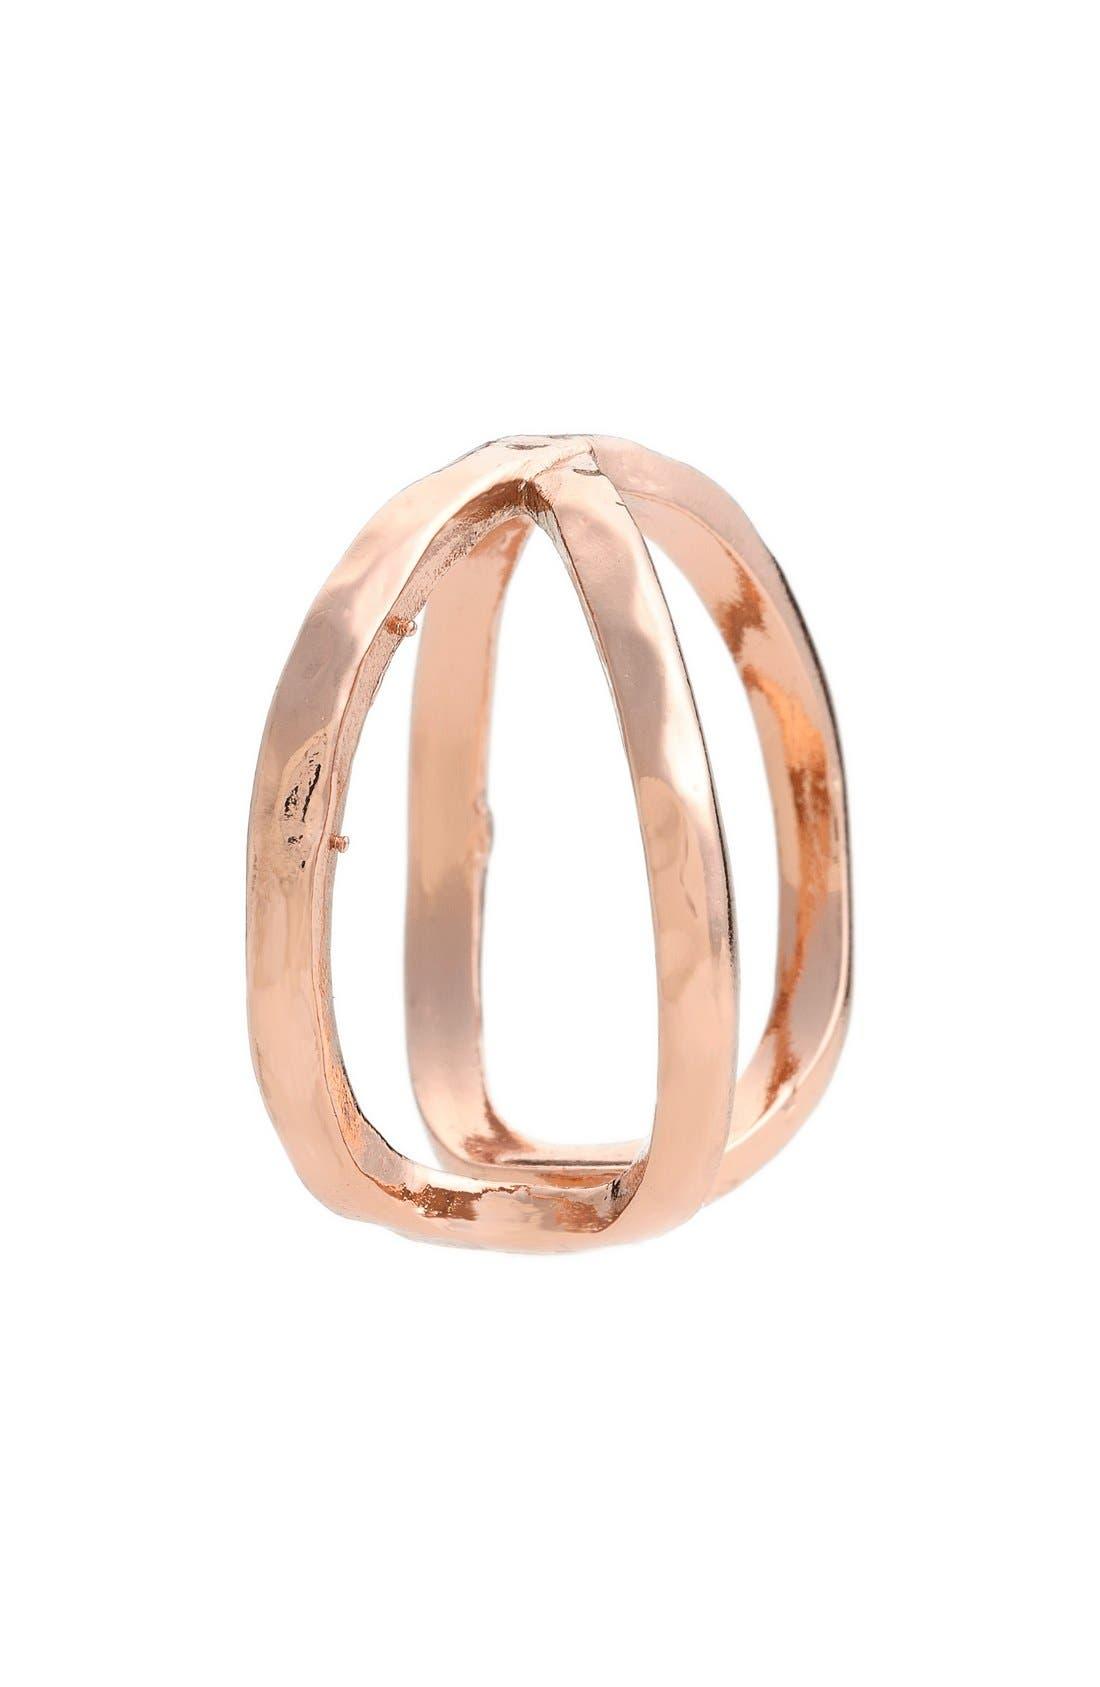 'Elea' Ring,                             Alternate thumbnail 2, color,                             ROSE GOLD